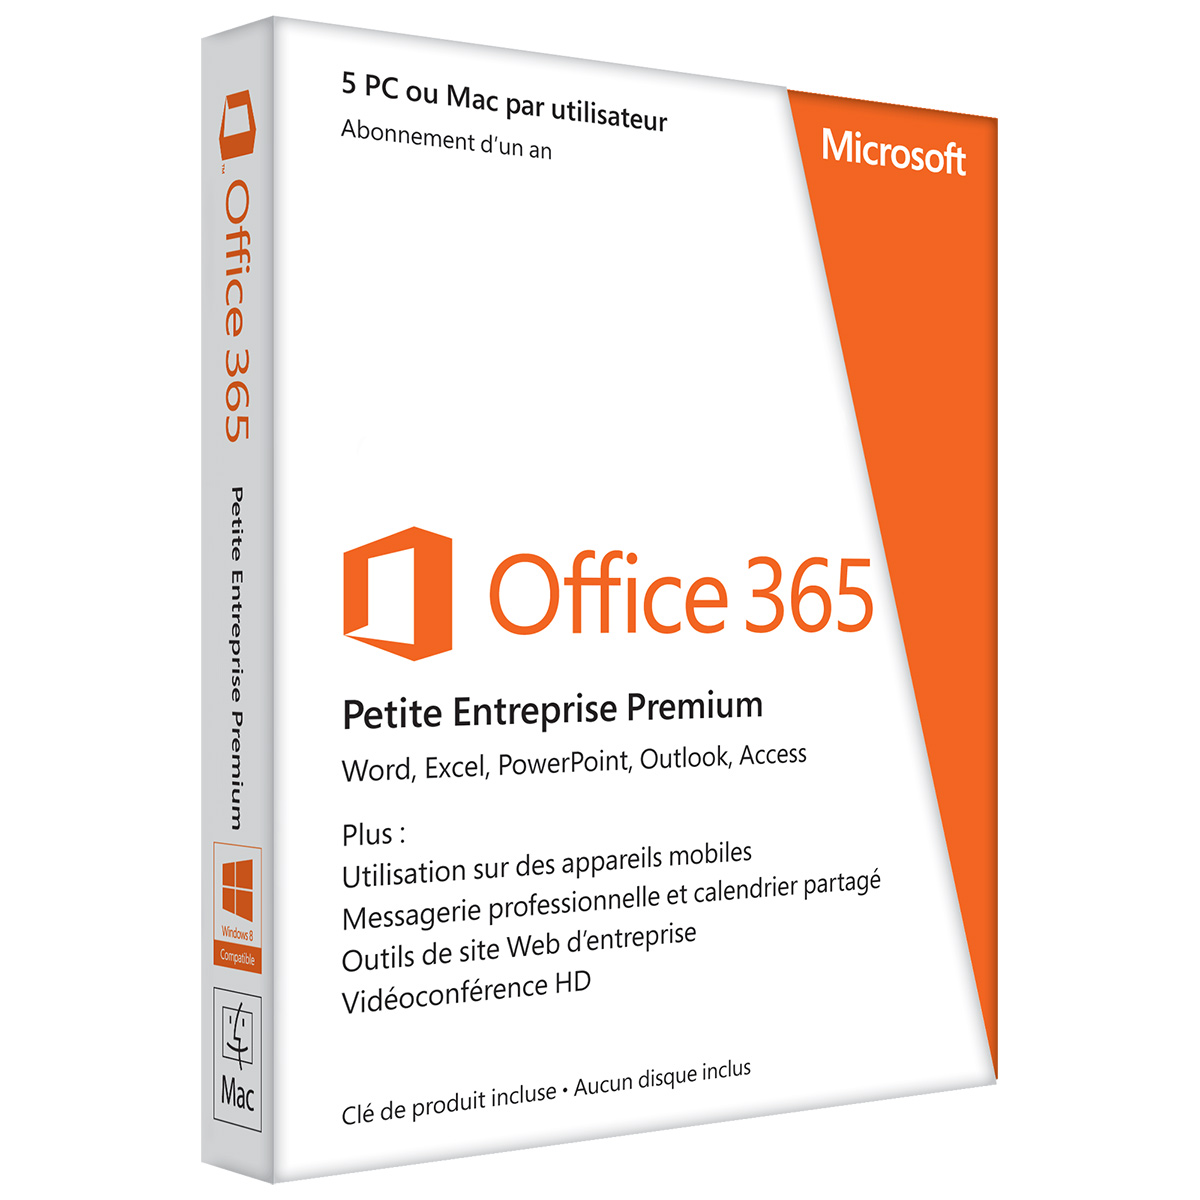 Microsoft office 365 petite entreprise premium 6sr 00029 - Cle activation office 365 famille premium ...